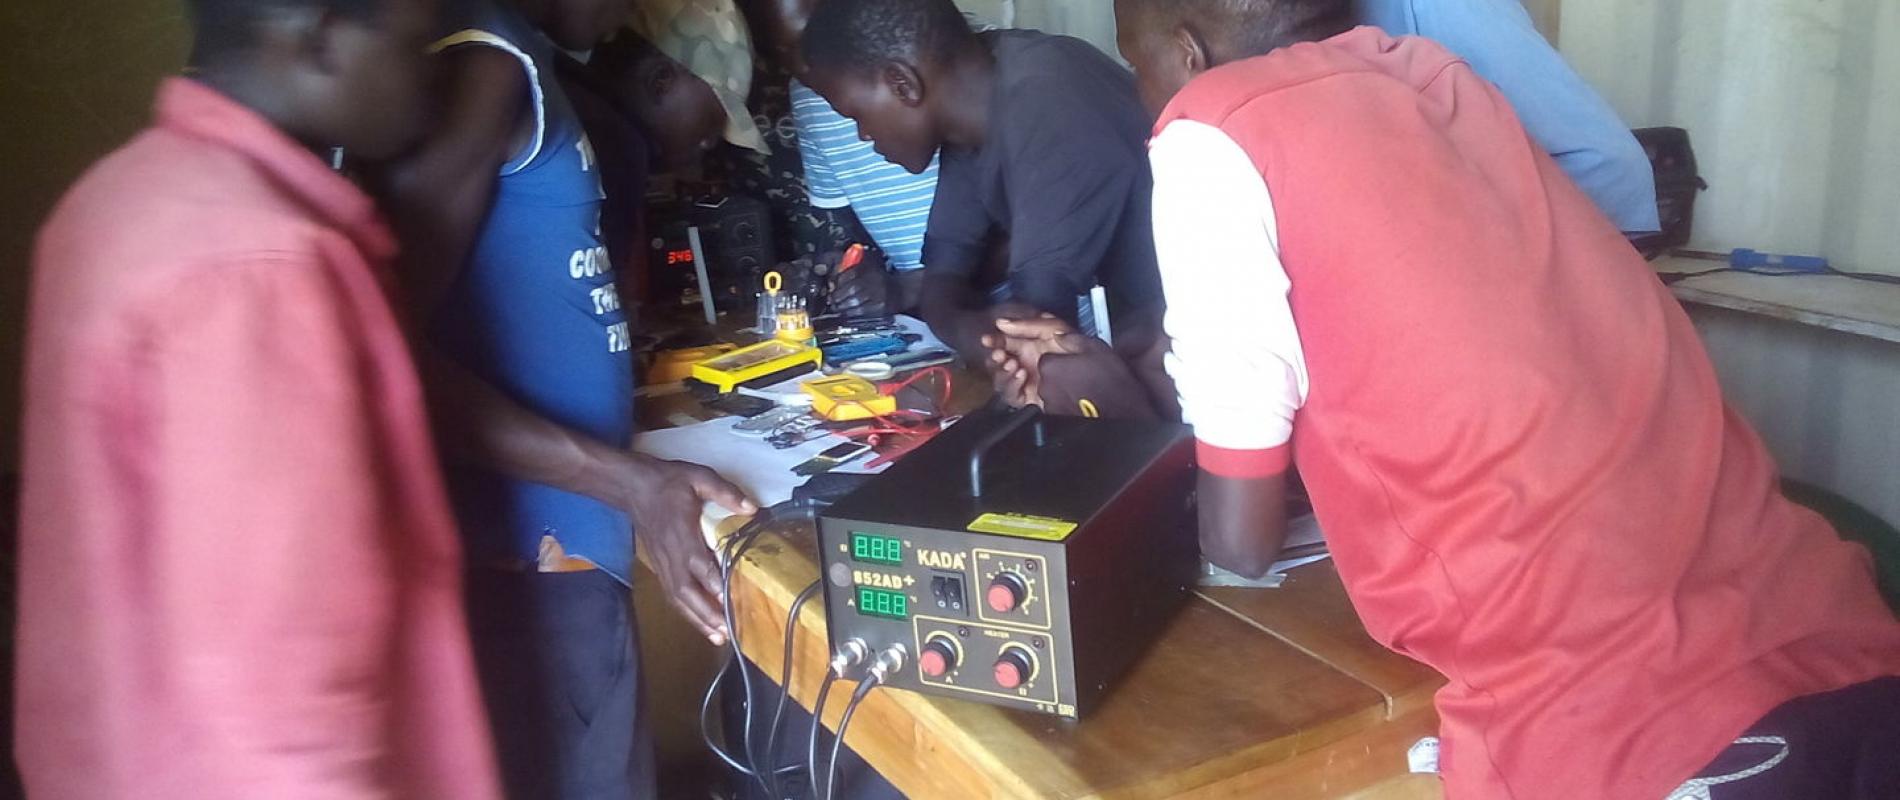 Phone and radio students